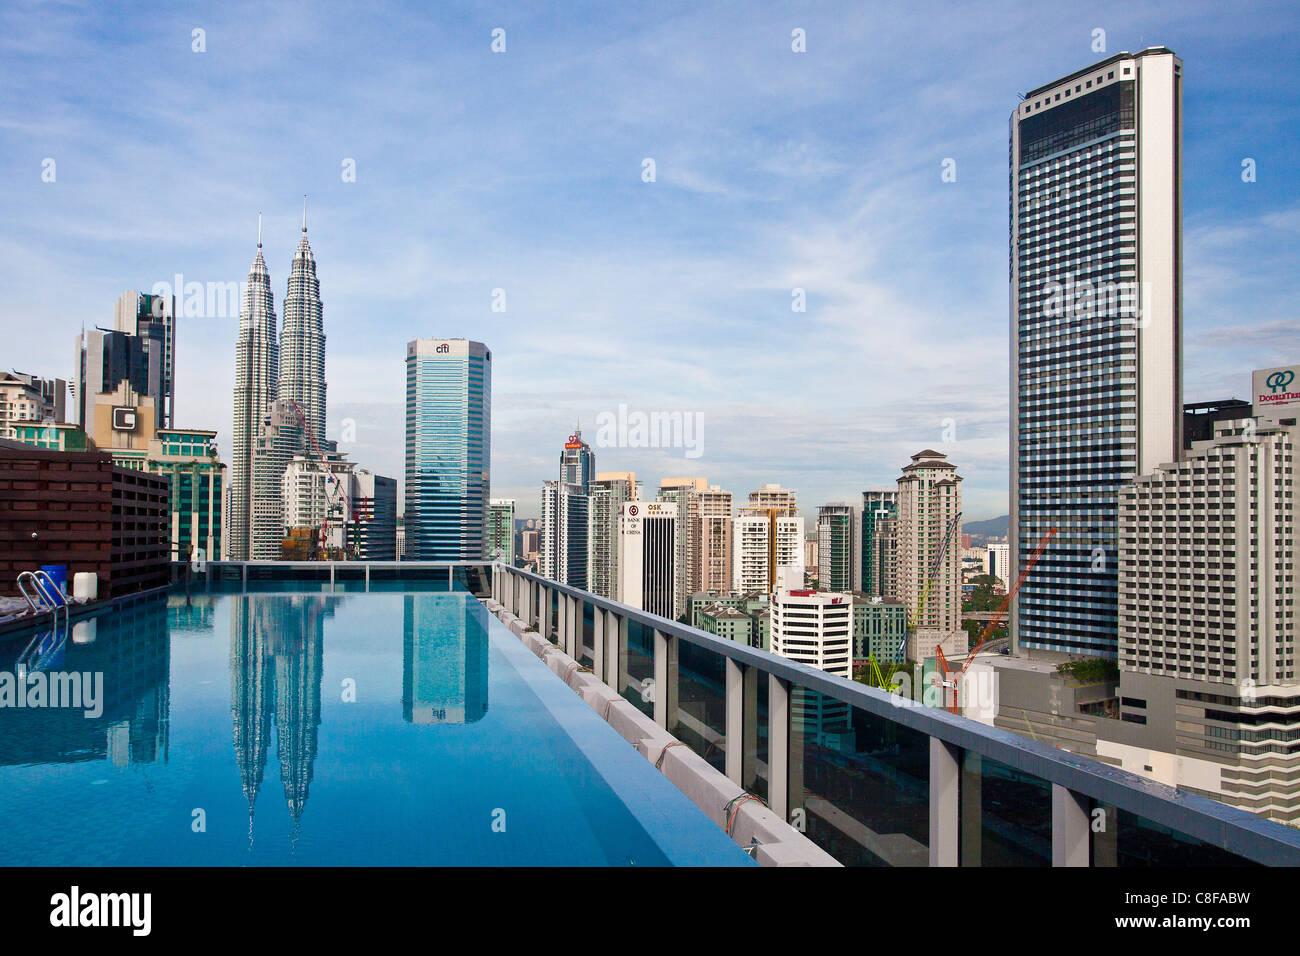 Malaysia, Asia, Kuala Lumpur, Golden Triangle District, Petronas Towers, blocks of flats, high-rise buildings, Skyline, - Stock Image